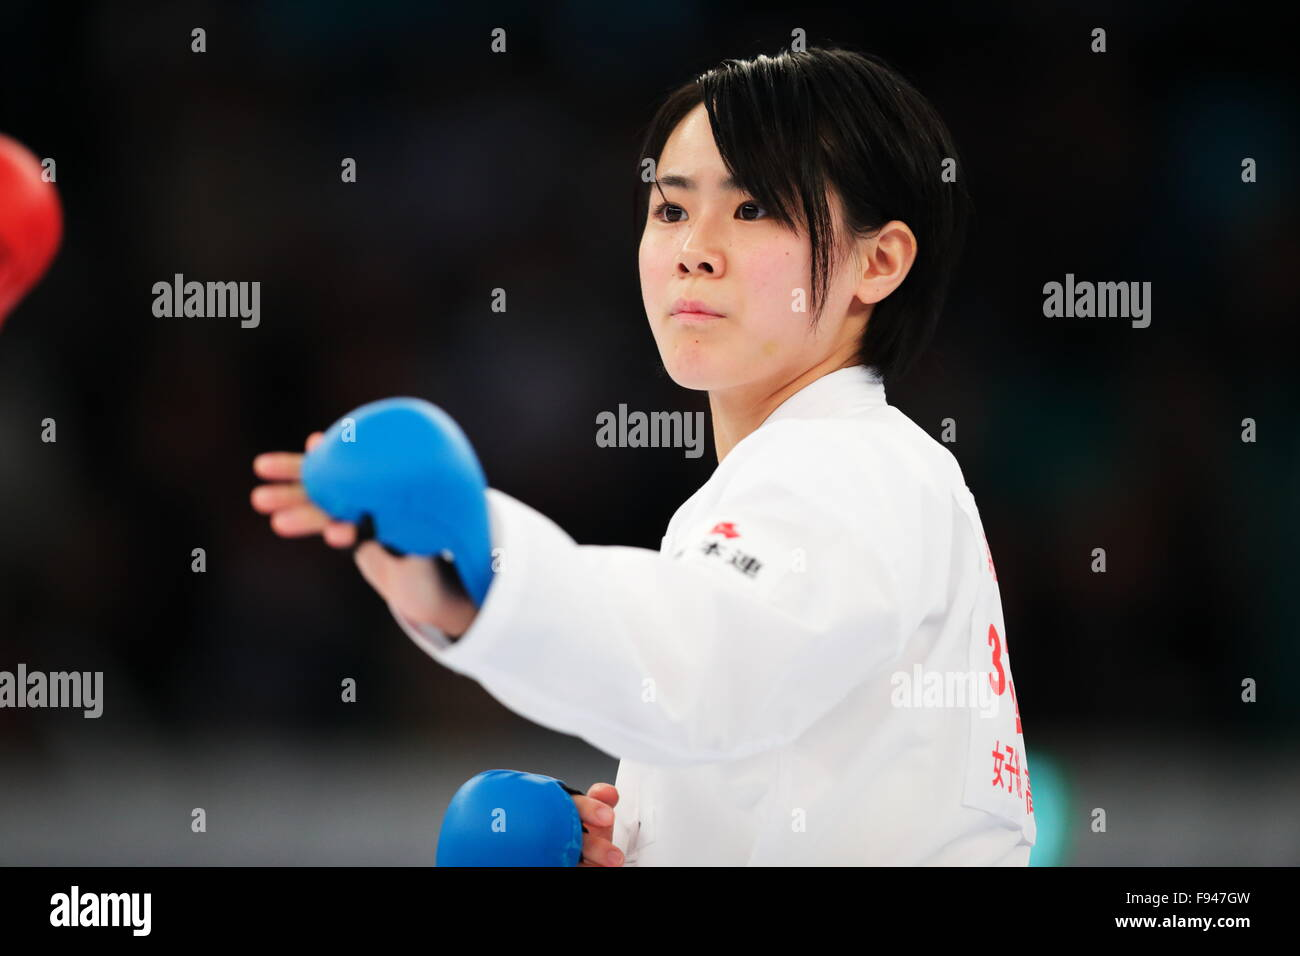 Karatedo Stock Photos & Karatedo Stock Images - Page 2 - Alamy